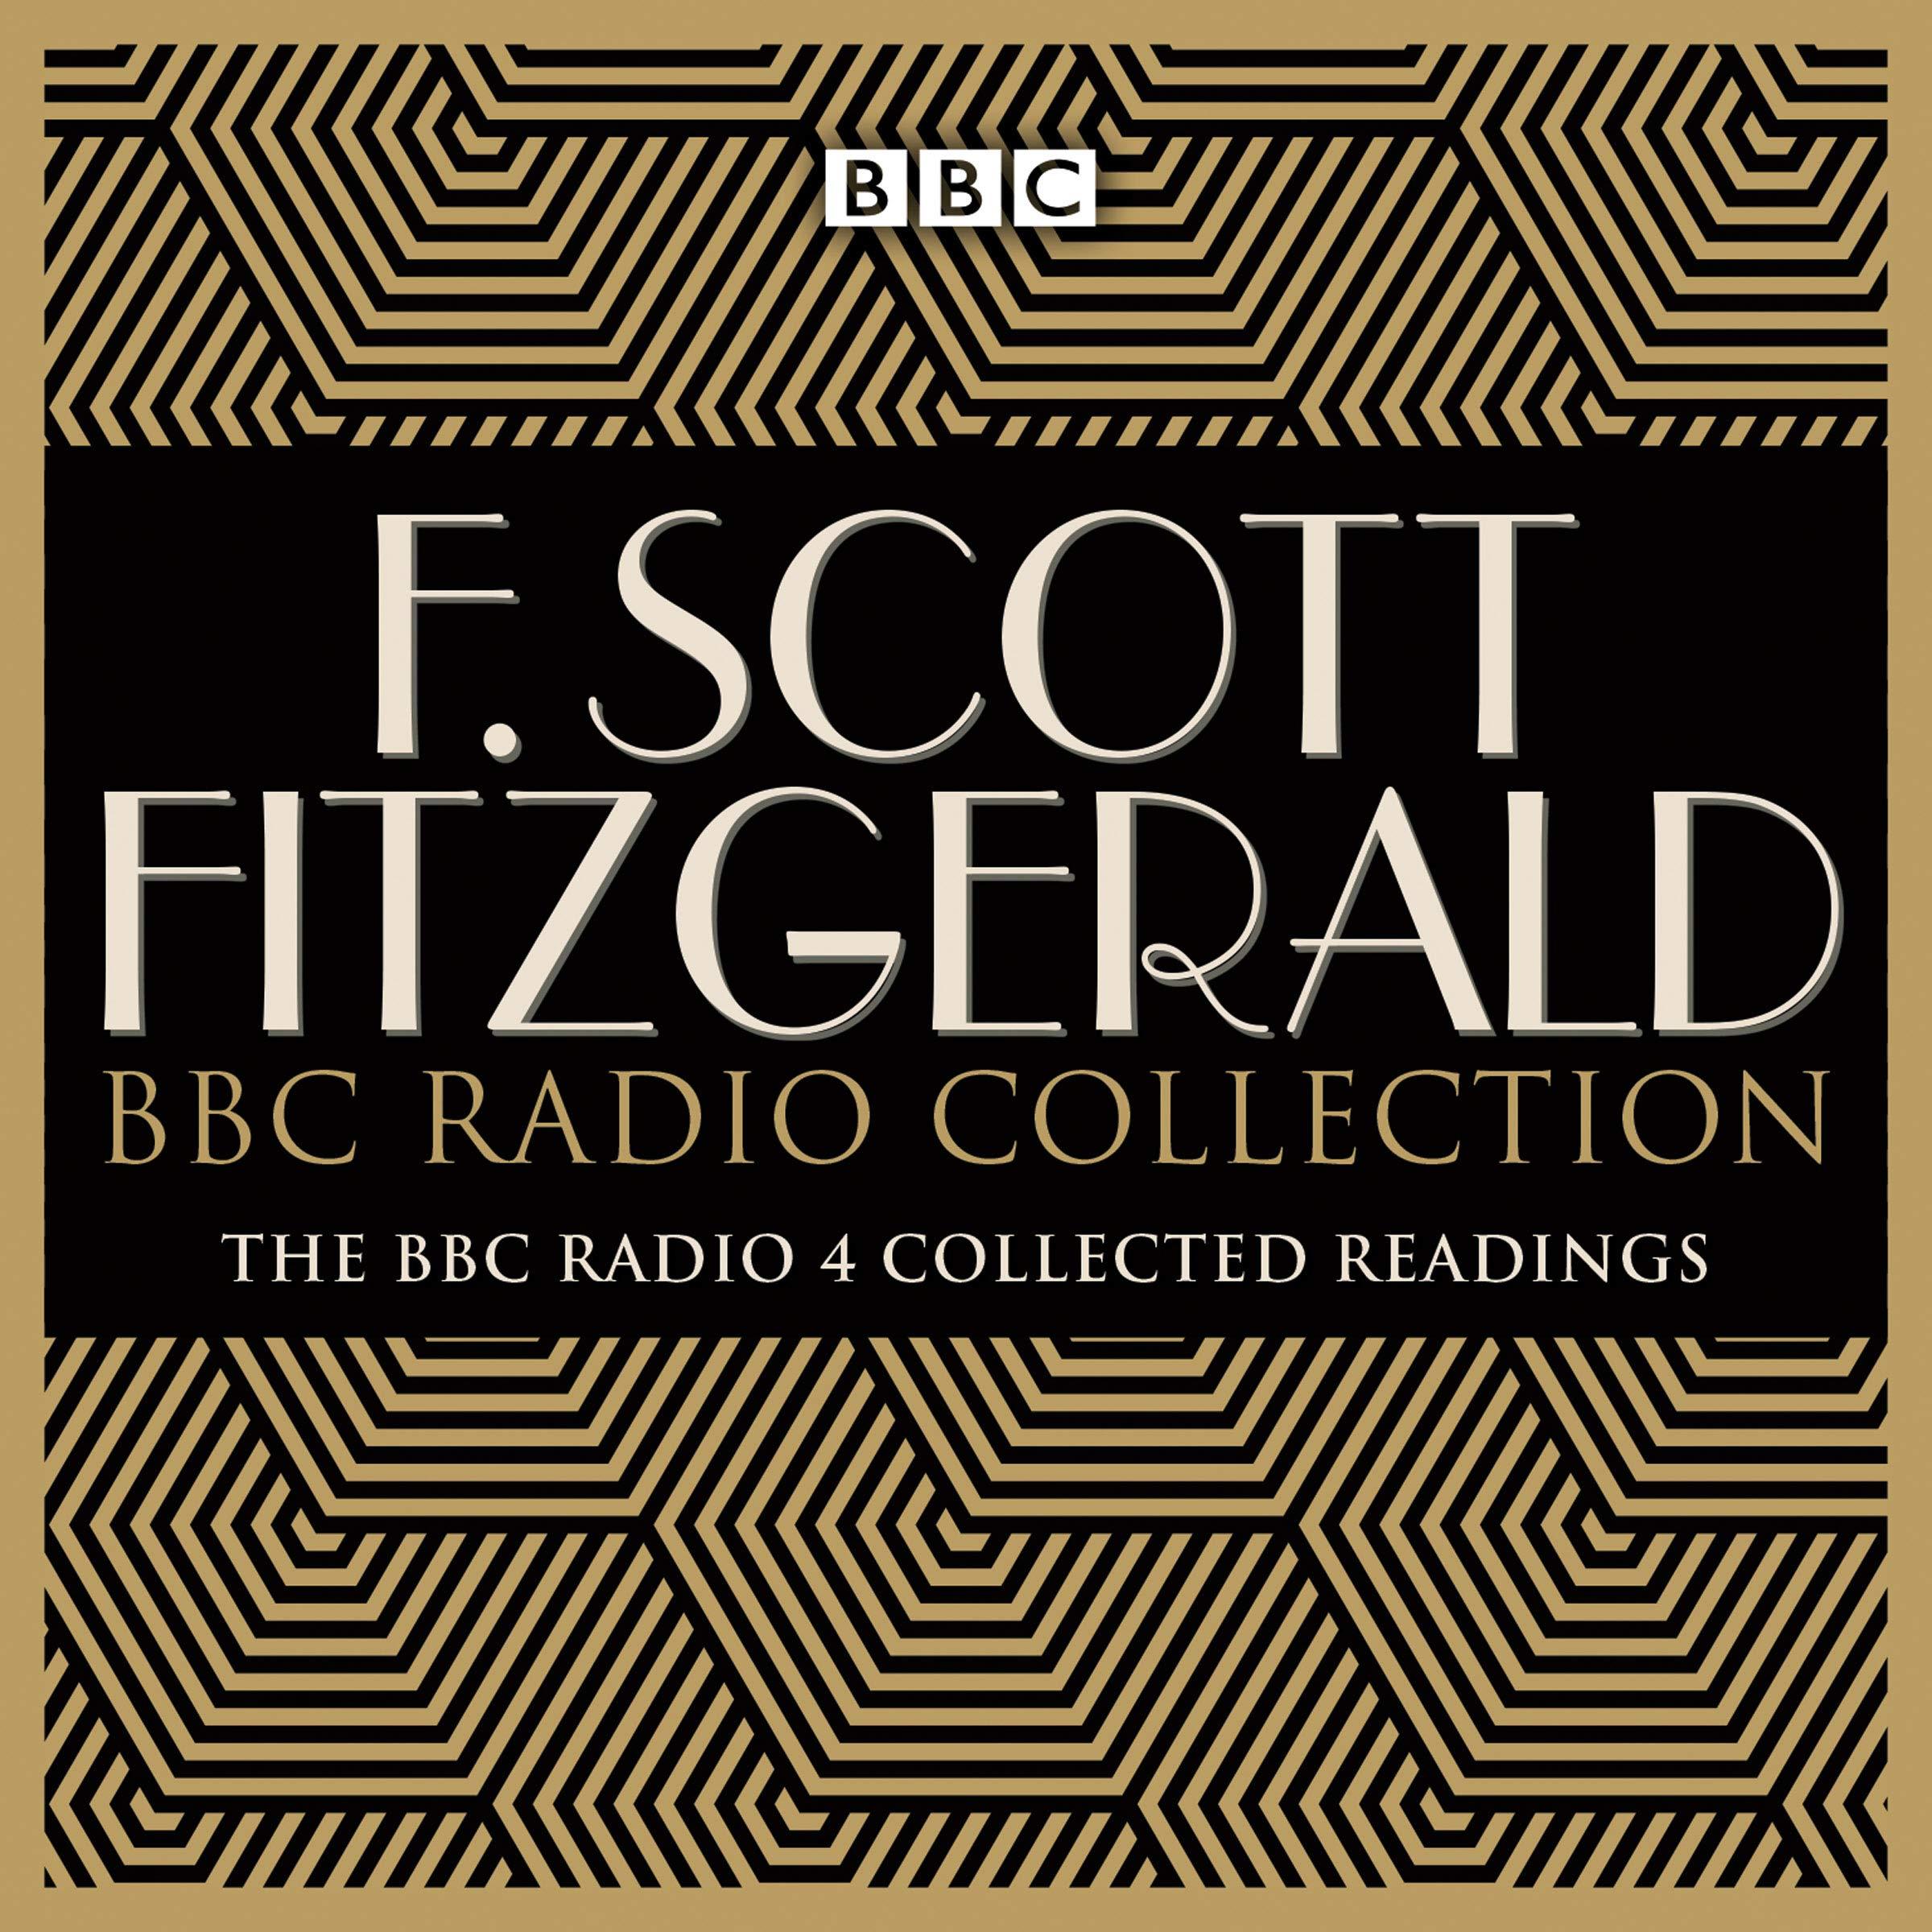 The F Scott Fitzgerald BBC Radio Collection Audio CD – Audiobook,  International Edition